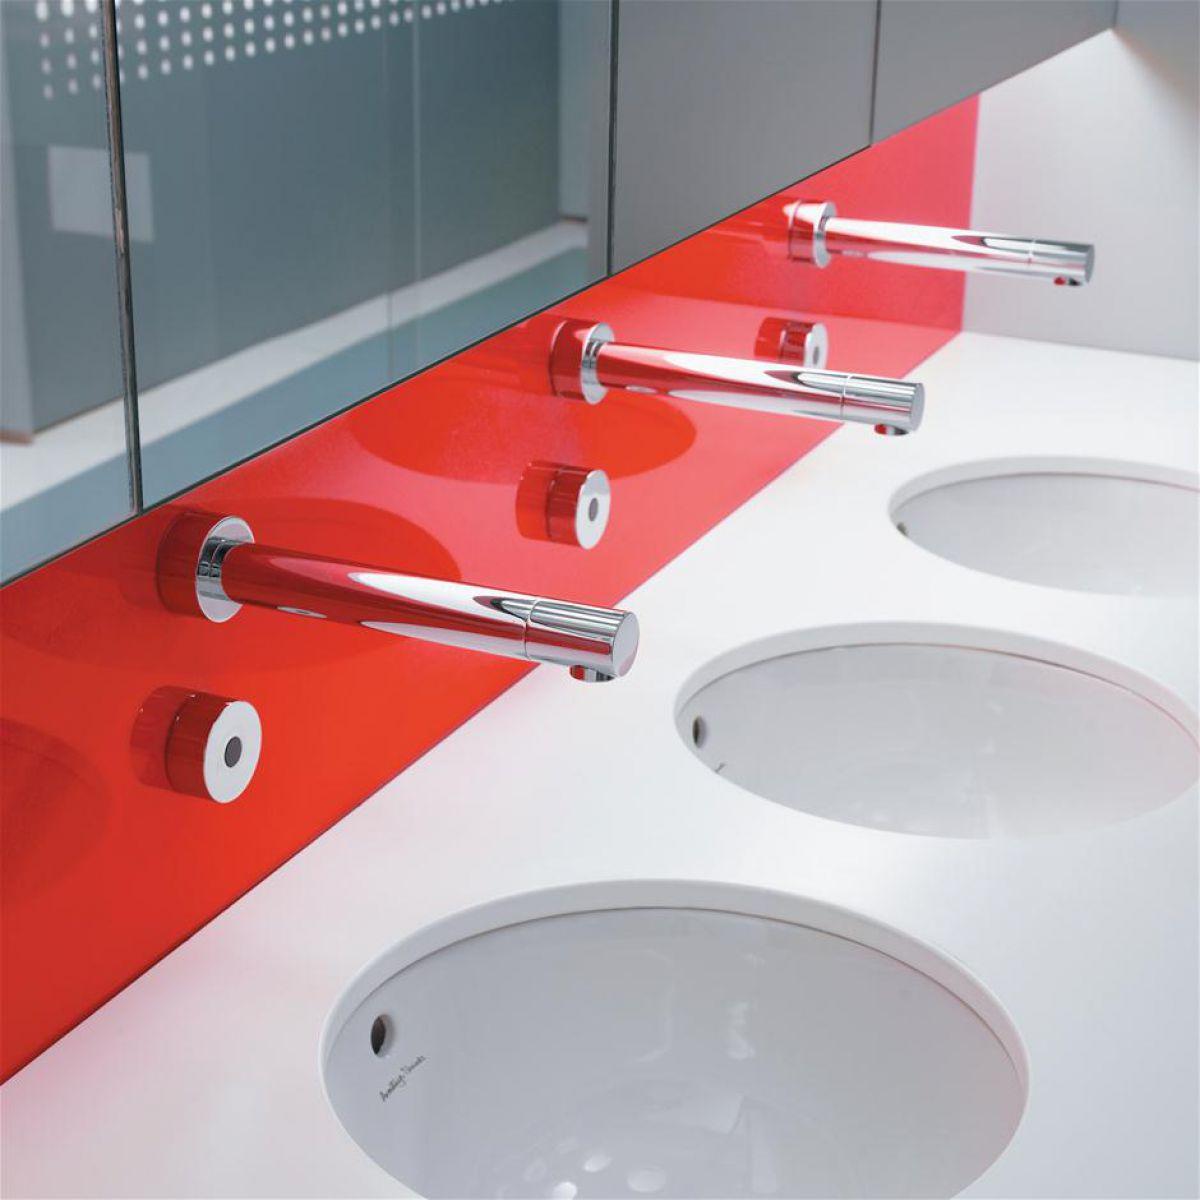 Armitage shanks bathroom sinks -  Armitage Shanks Cherwell Under Countertop Basin